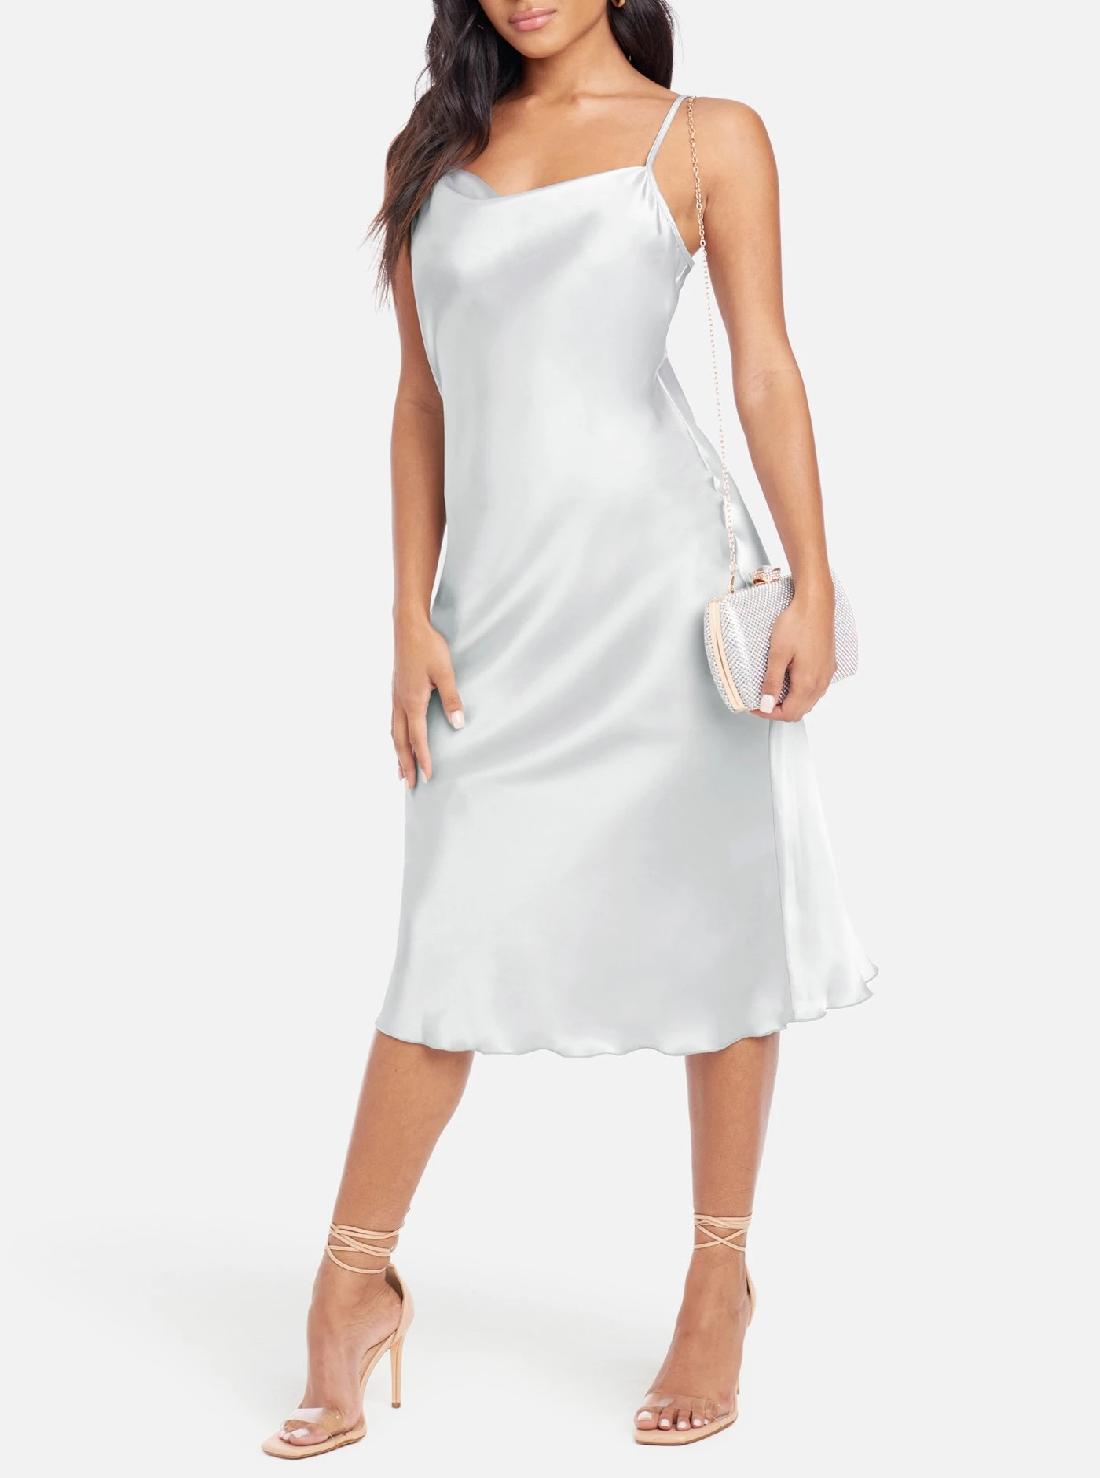 2 Wholesale Casual Satin Dress